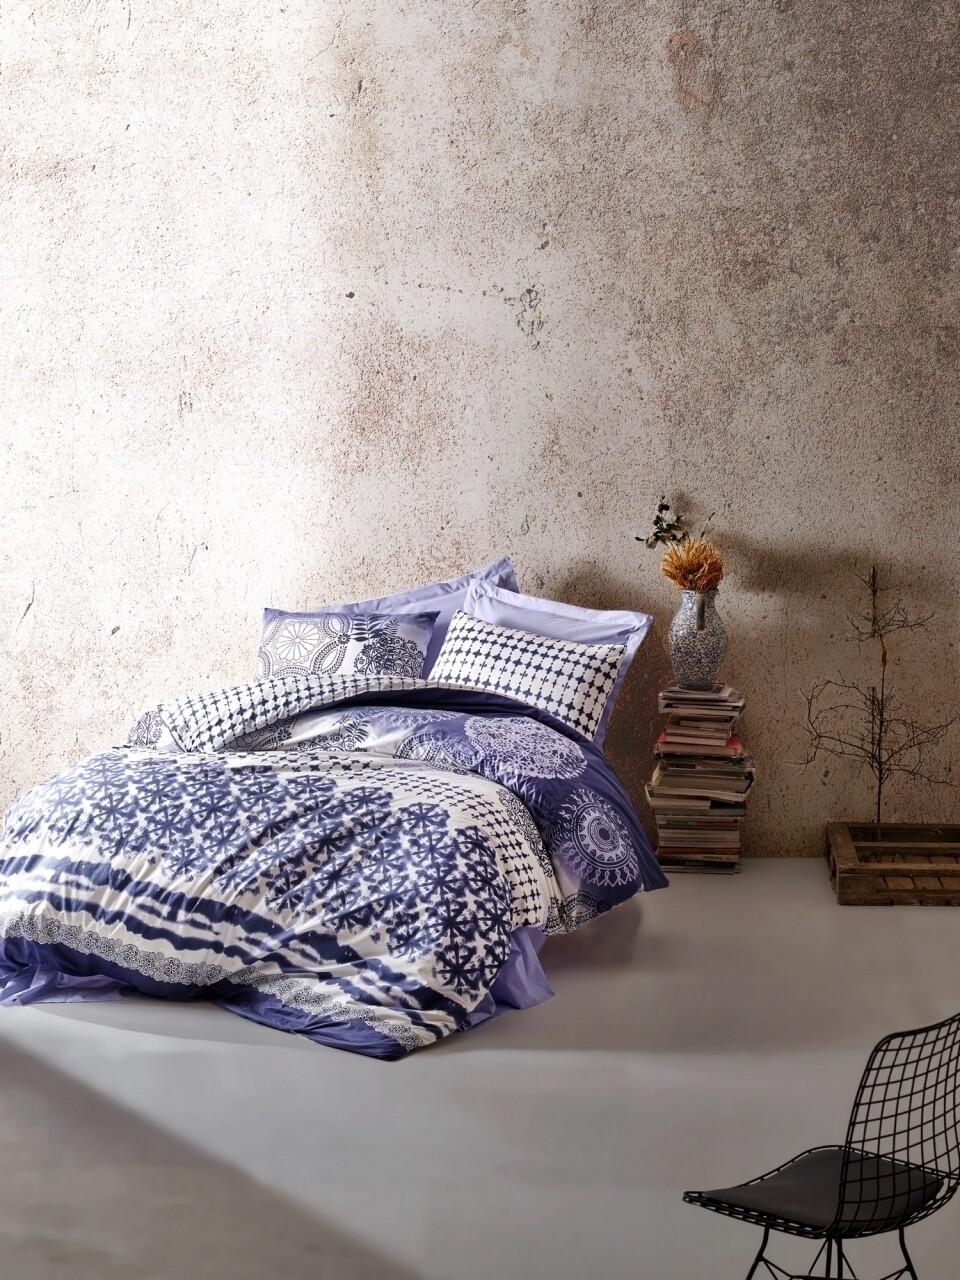 Lenjerie de pat pentru o persoana, 3 piese, 100% bumbac ranforce, Cotton Box, Lucca